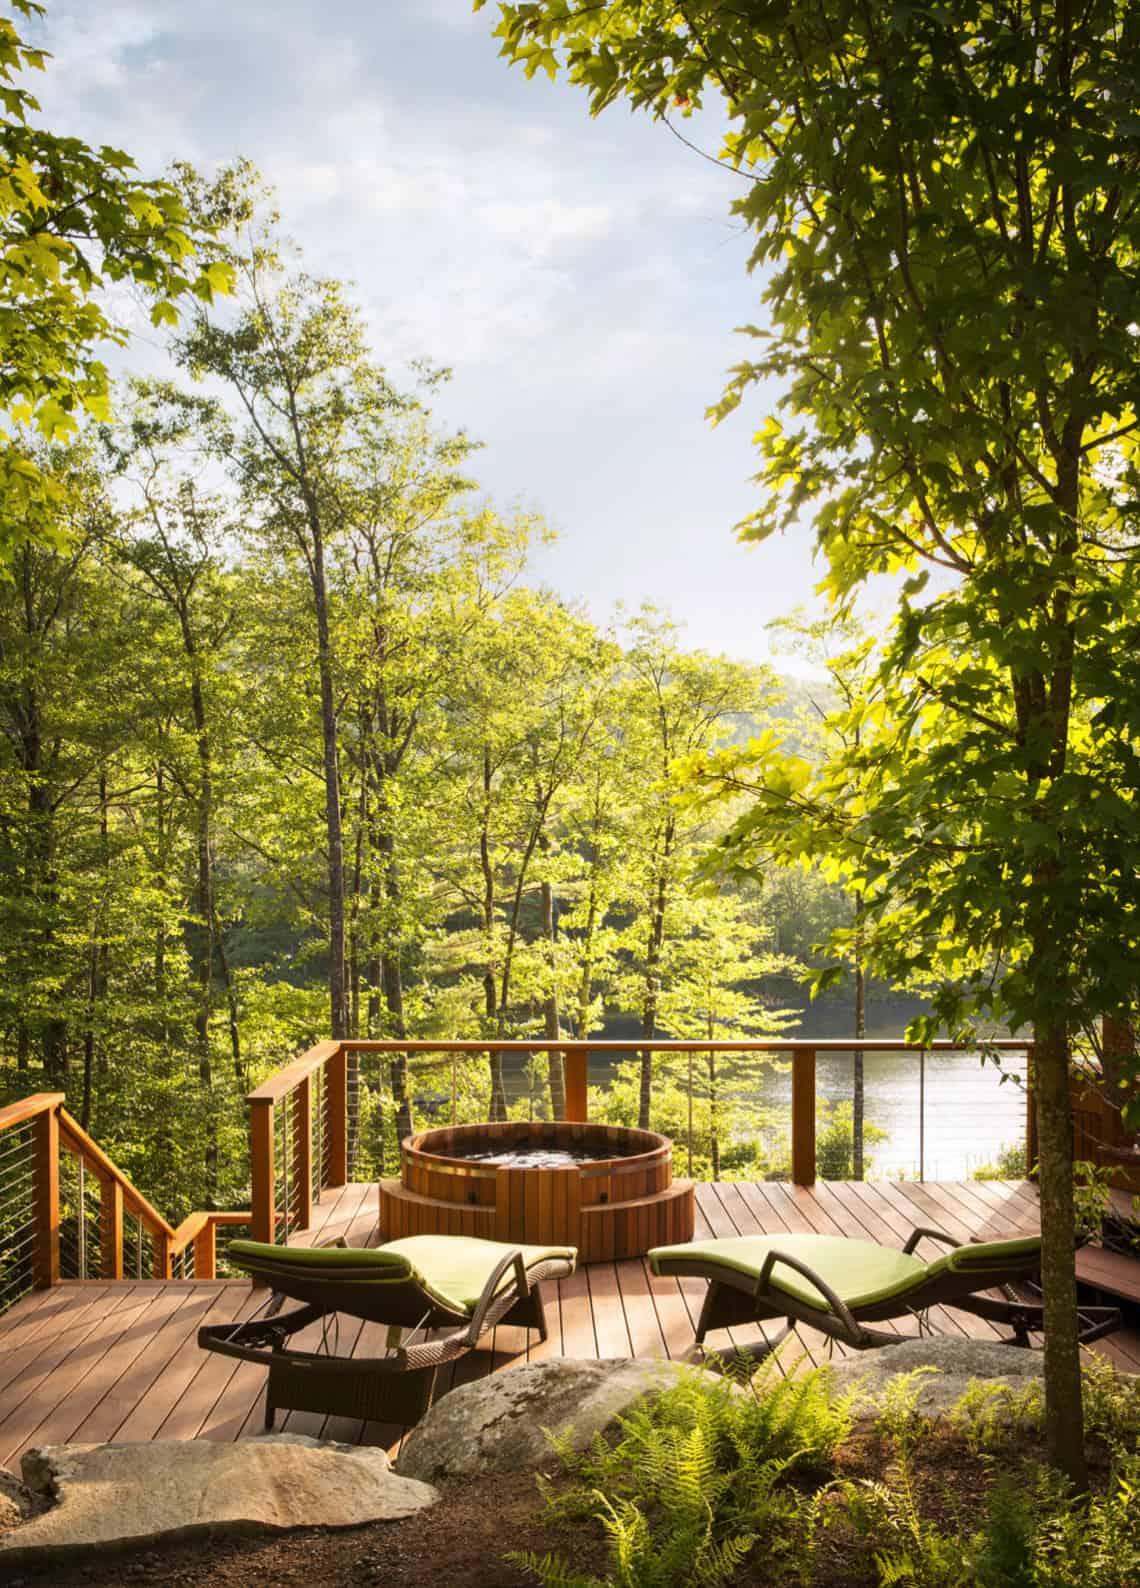 modern-lake-house-deck-with-a-hot-tub